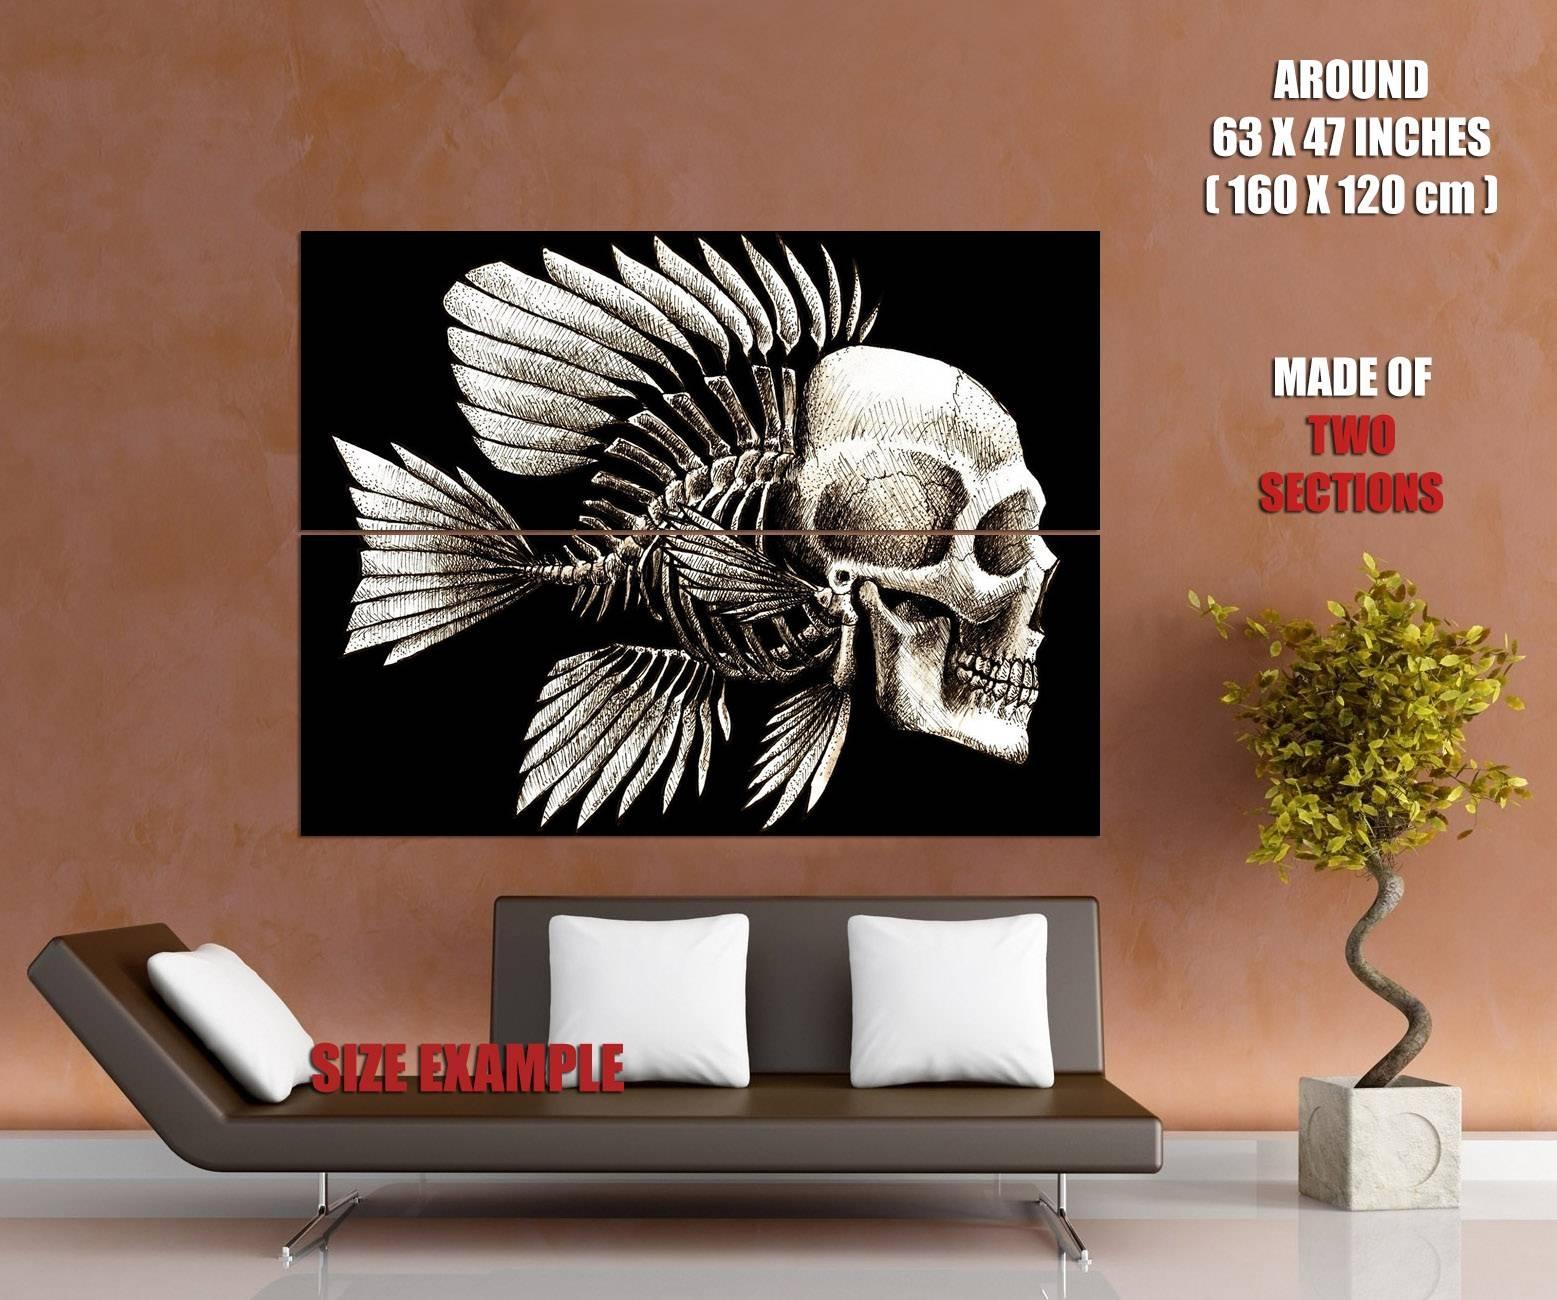 Skull Fish Bone Creative Art Wall Print Poster   Ebay Within 2018 Fish Bone Wall Art (View 19 of 20)